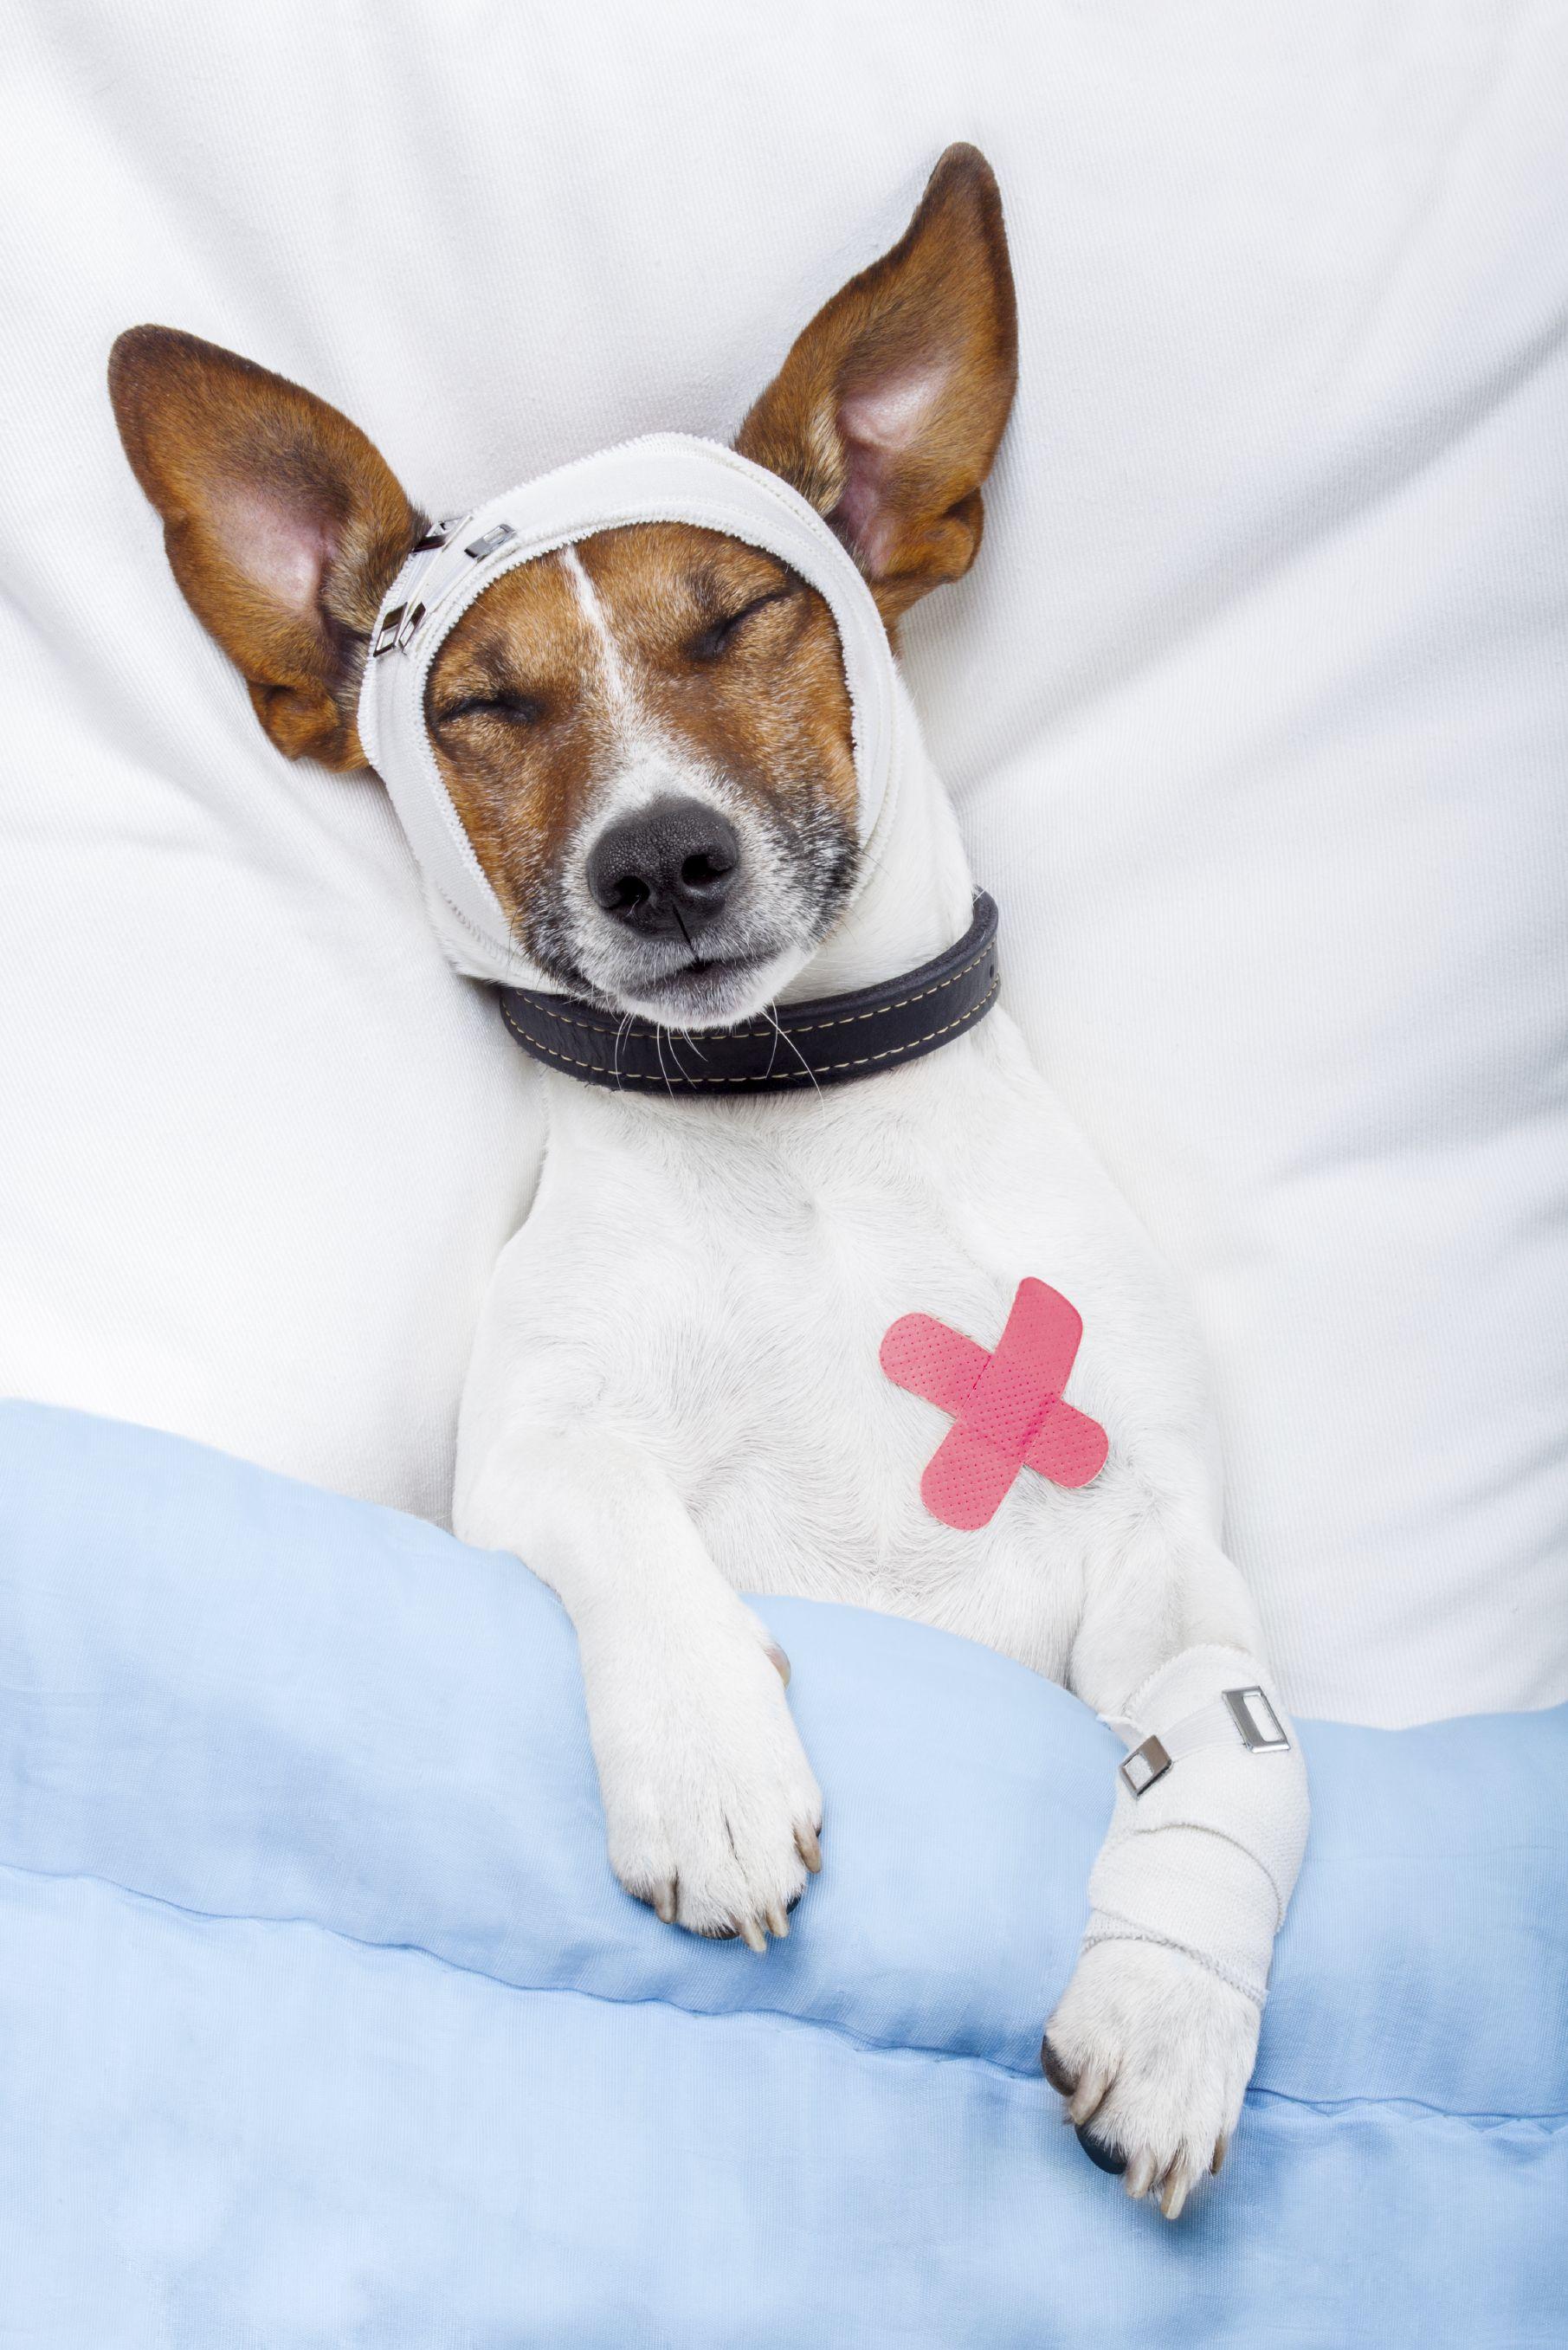 Pin On Dog And Cat Orthopedic Surgery Miramar Florida